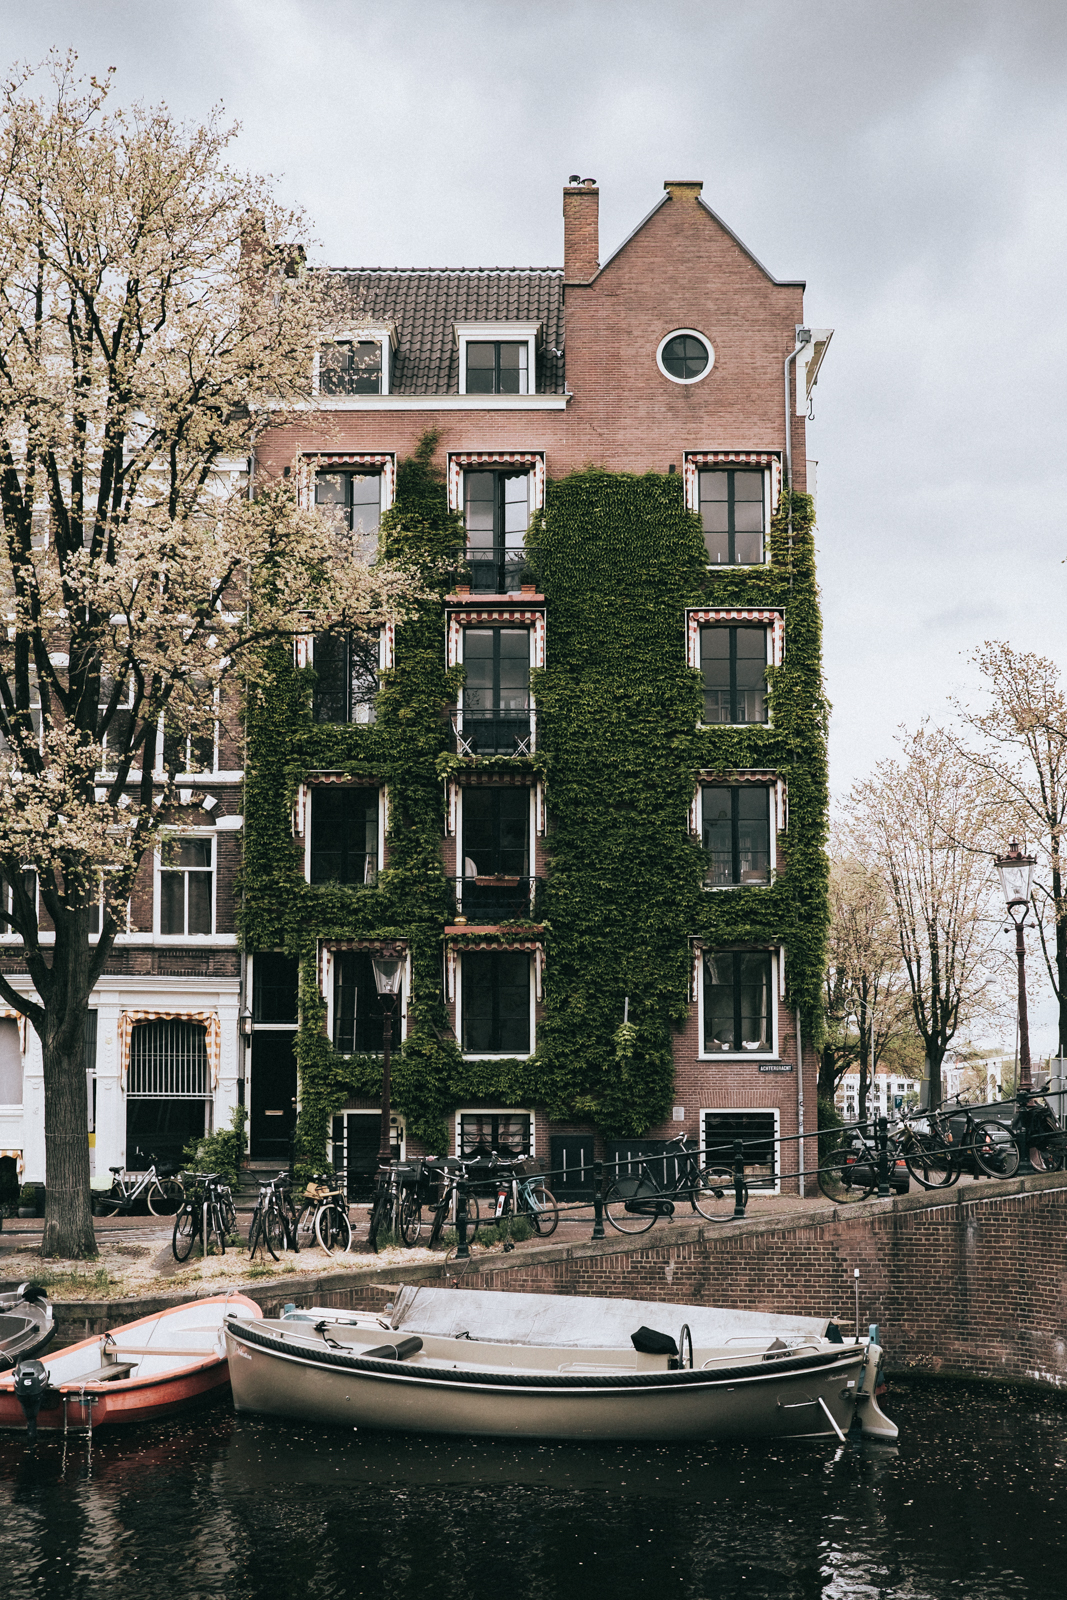 amsterdam-russell-rabanal-7786.jpg